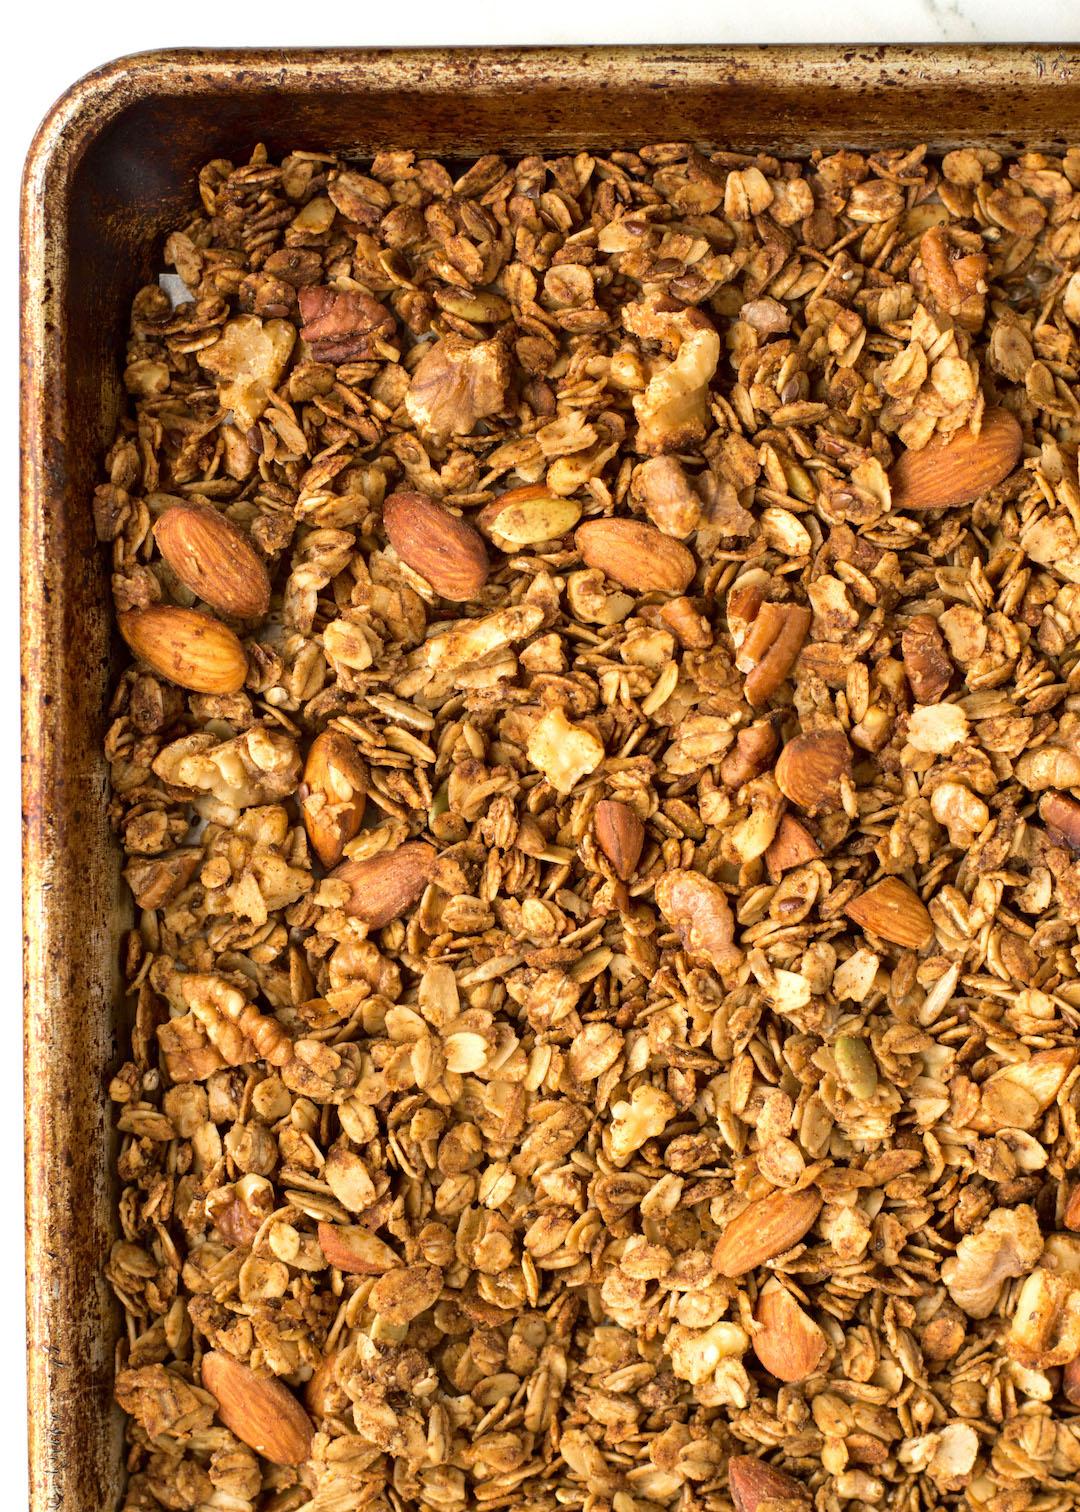 Superfood Gingerbread Granola | breakfast | granola | recipe | superfood, super seeds, nuts and seeds | gluten free, dairy free, vegan possible | gingerbread recipe | festive breakfast